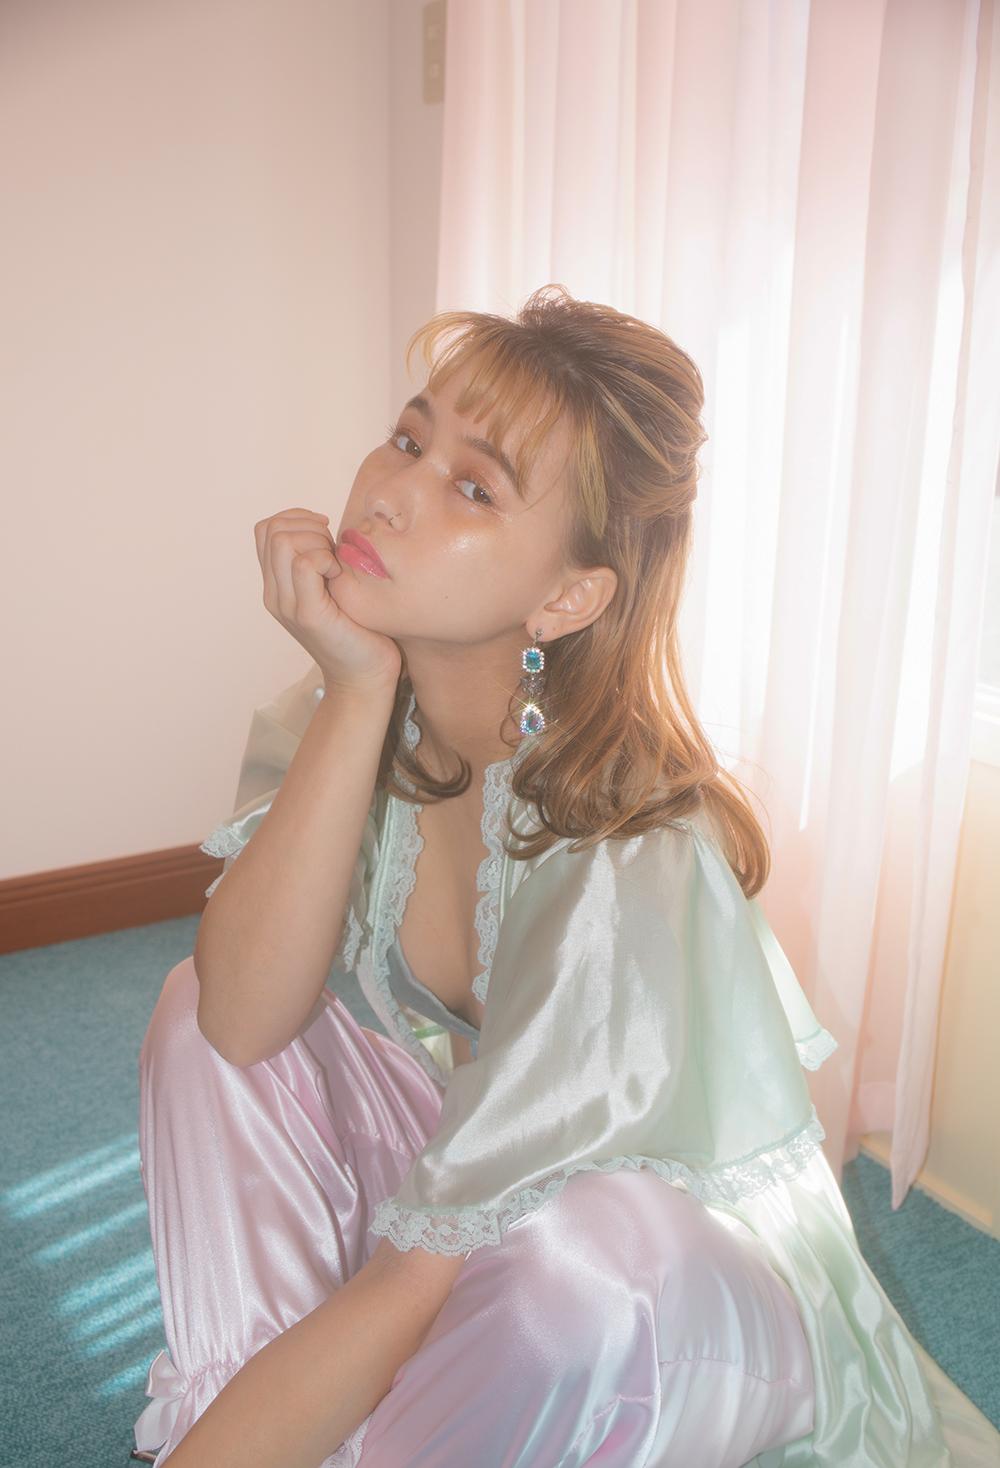 (再入荷)AURORA BLUE DROP EARRING & PIERCE